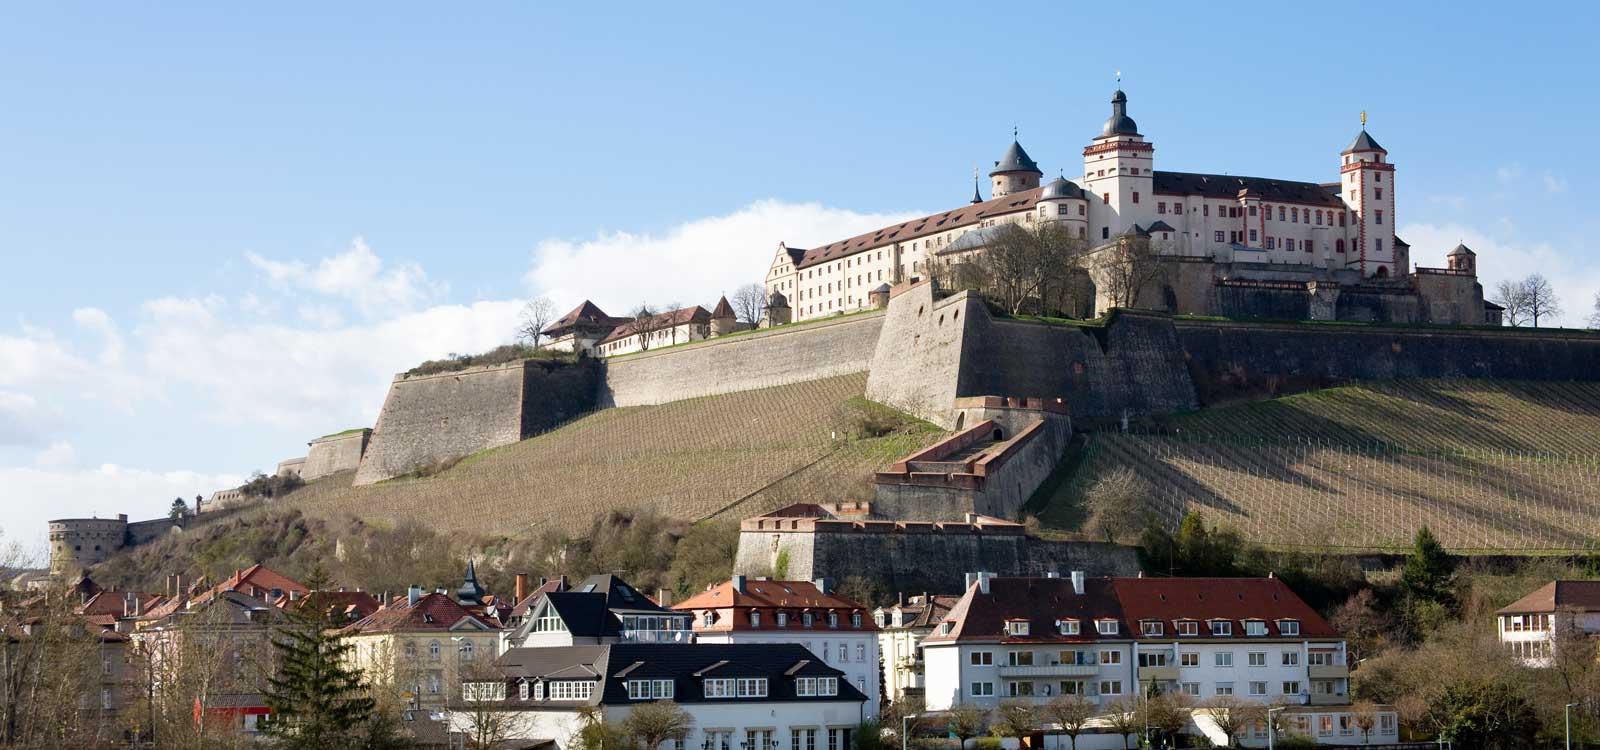 Ibis Wurzburg City Hotel